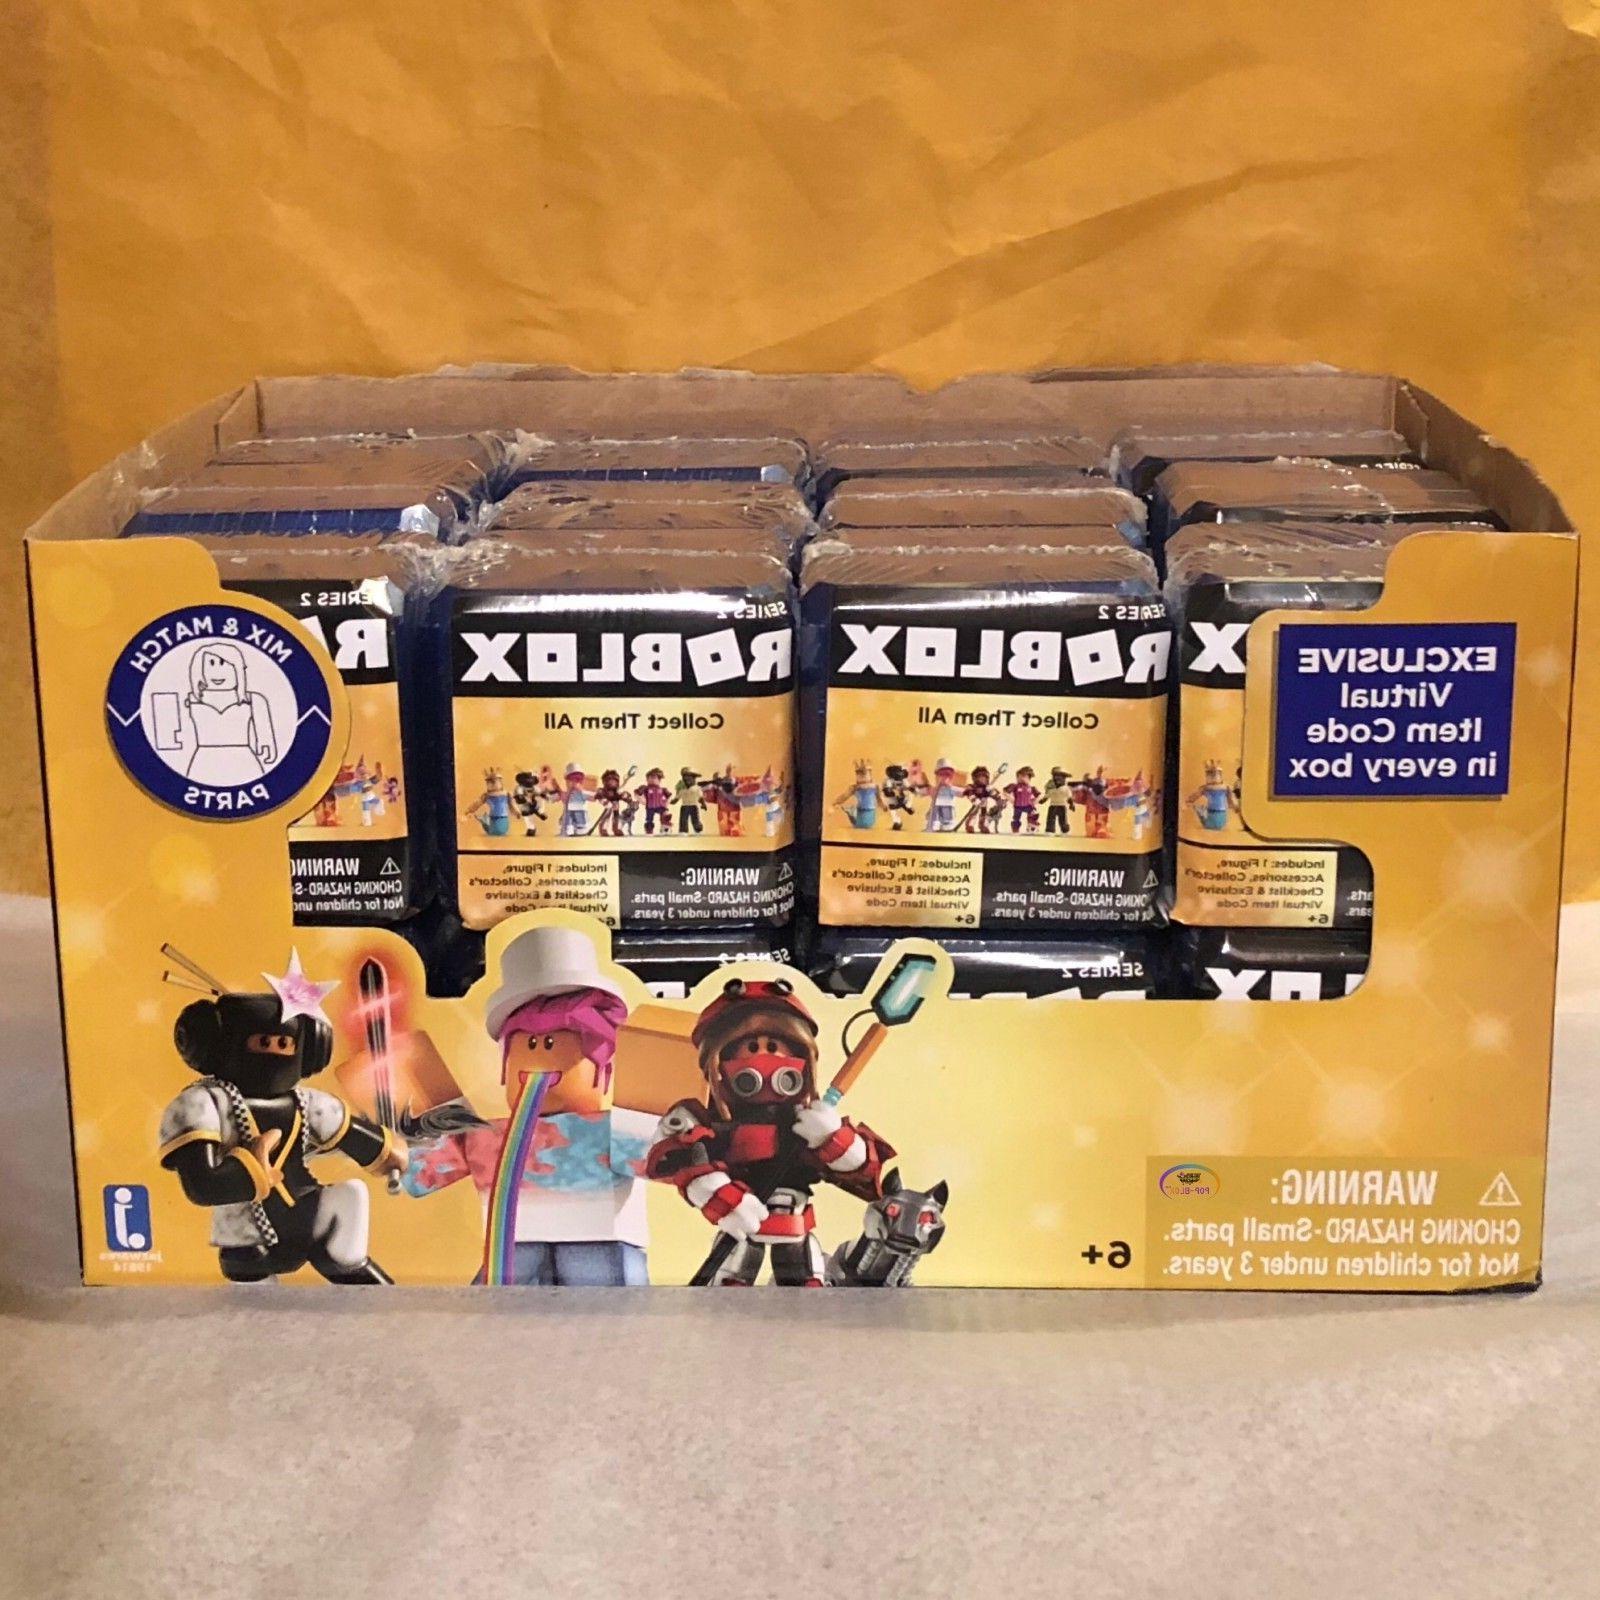 Roblox Rockstar Celebrity Gold Series 1 Mystery 3 Toys - Roblox Insanelyluke Celebrity Gold Series 2 Mystery 3